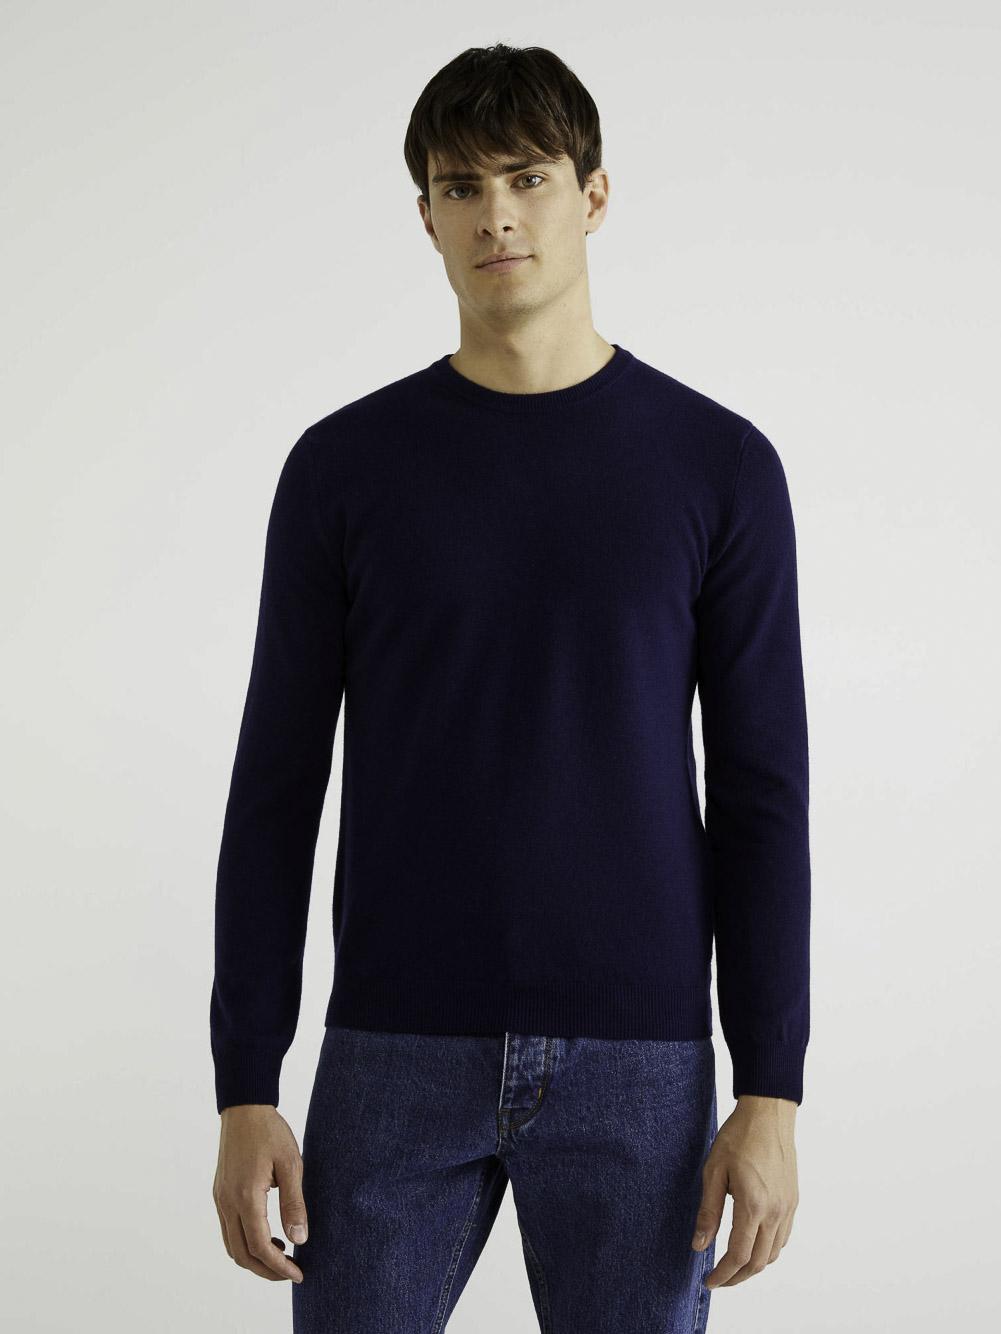 BENETTON Μπλούζα με λαιμόκοψη 100% παρθένο μαλλί 1002U1G34 20A016